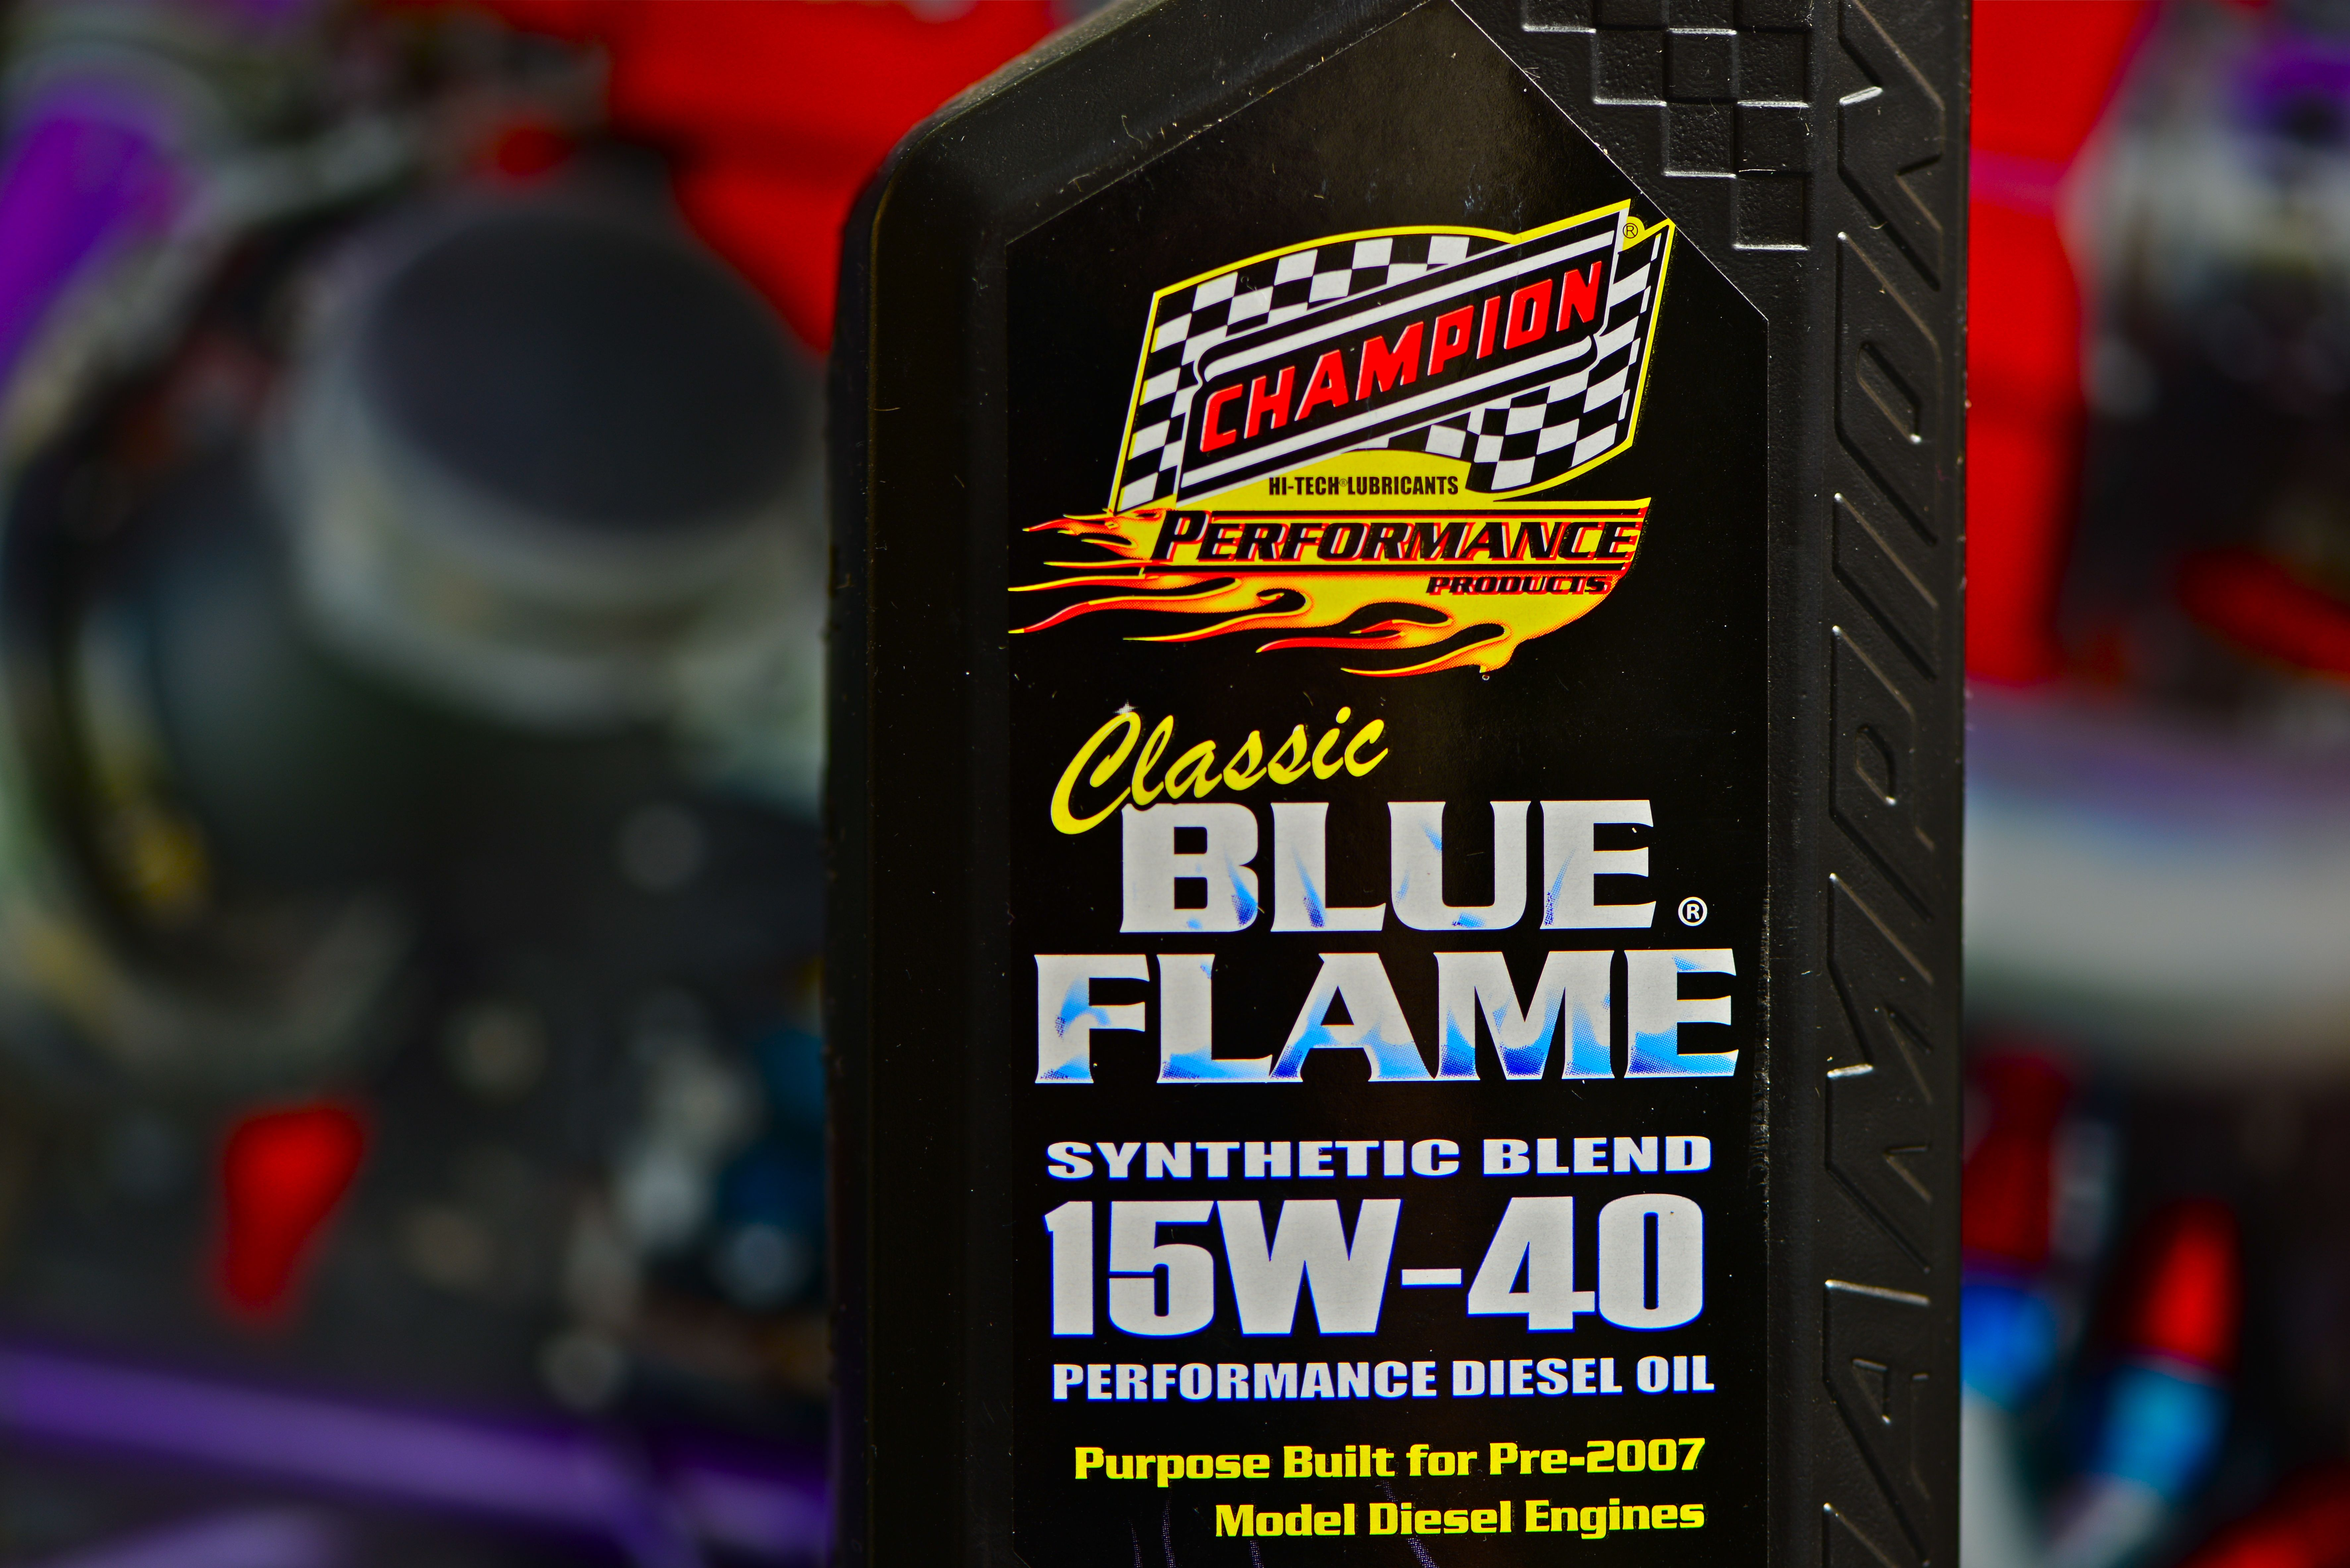 Champion Racing Oil Receives Platinum Facebook Recognition